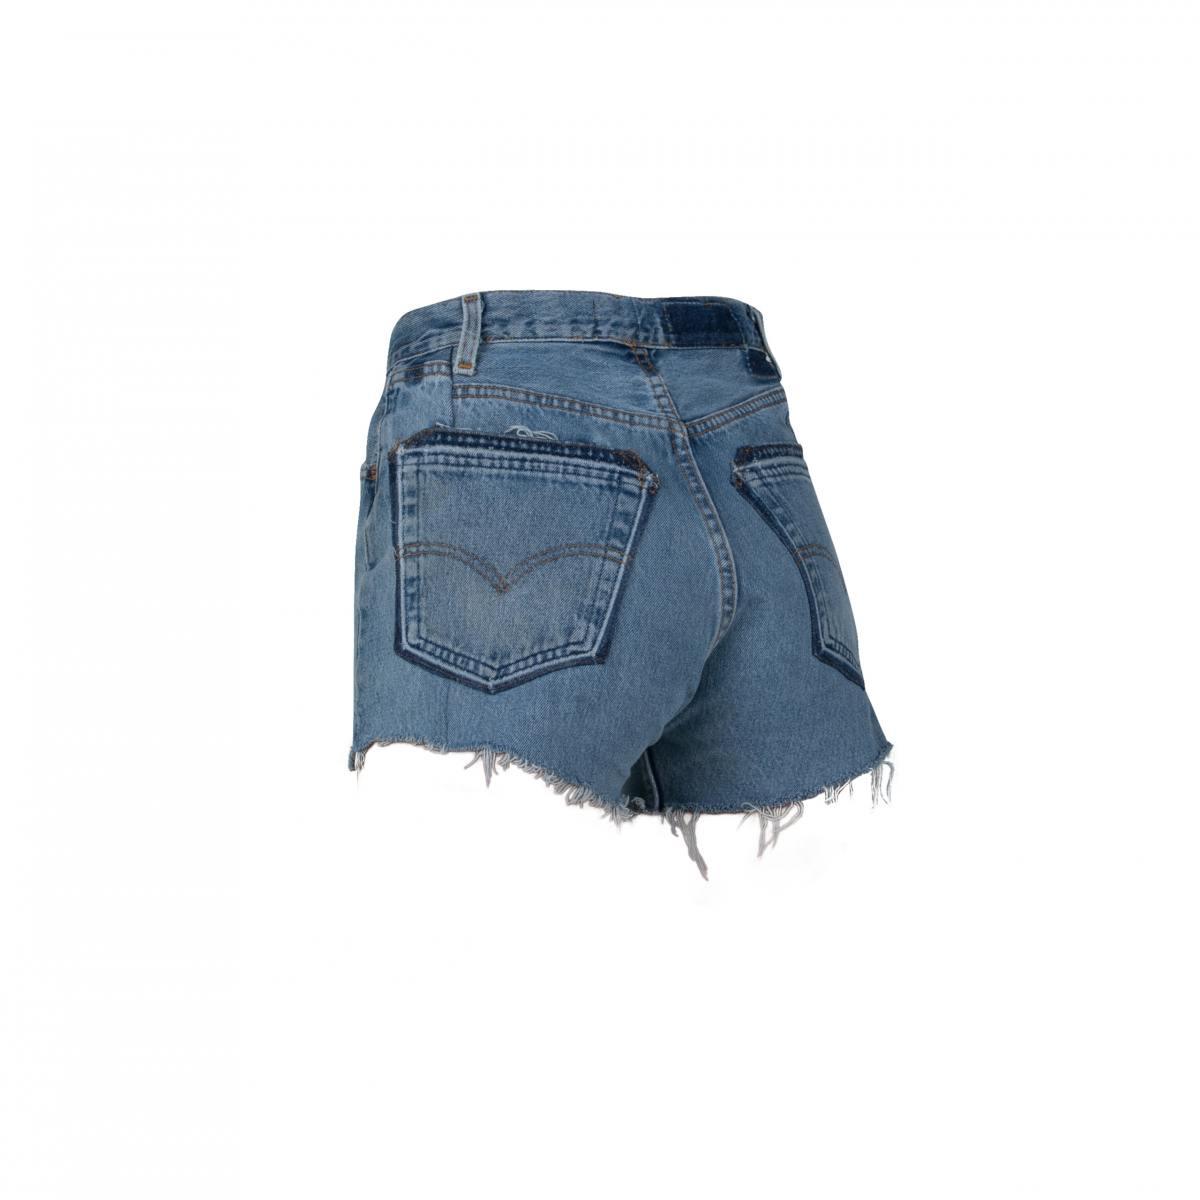 Unraveled Shorts by EB Denim, available on ebdenim.com for $195 Hailey Baldwin Shorts SIMILAR PRODUCT